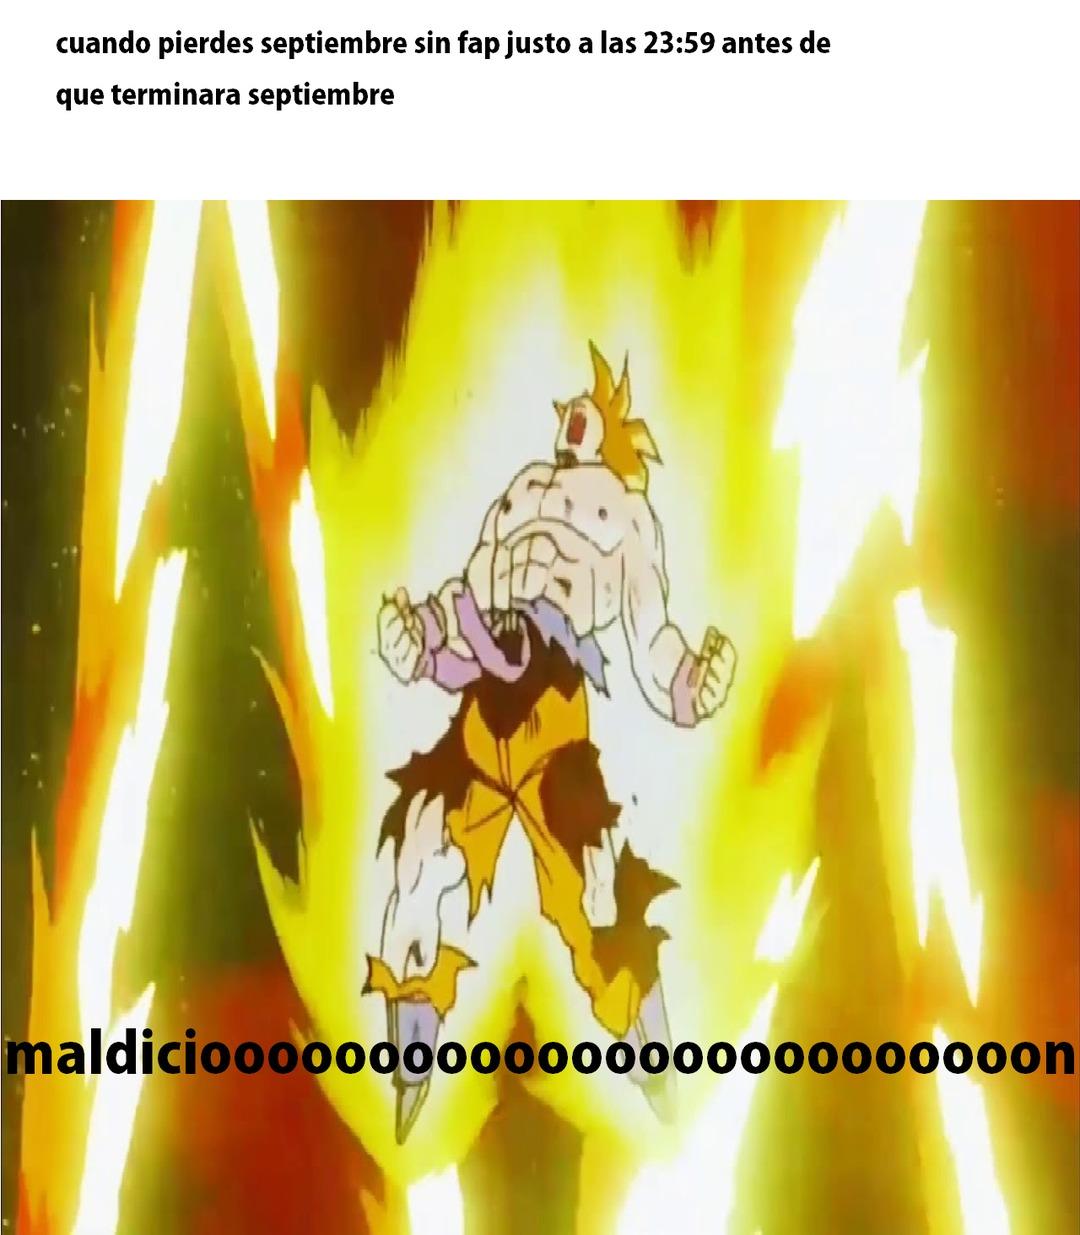 30 de septiembre a las 23:59 - meme